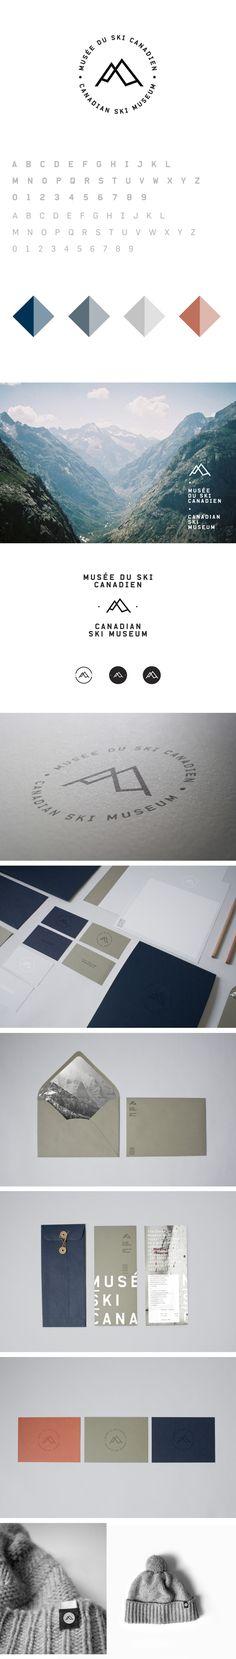 / | #stationary #corporate #design #corporatedesign #identity #branding #marketing < repinned by www.BlickeDeeler.de | Take a look at www.LogoGestaltung-Hamburg.de